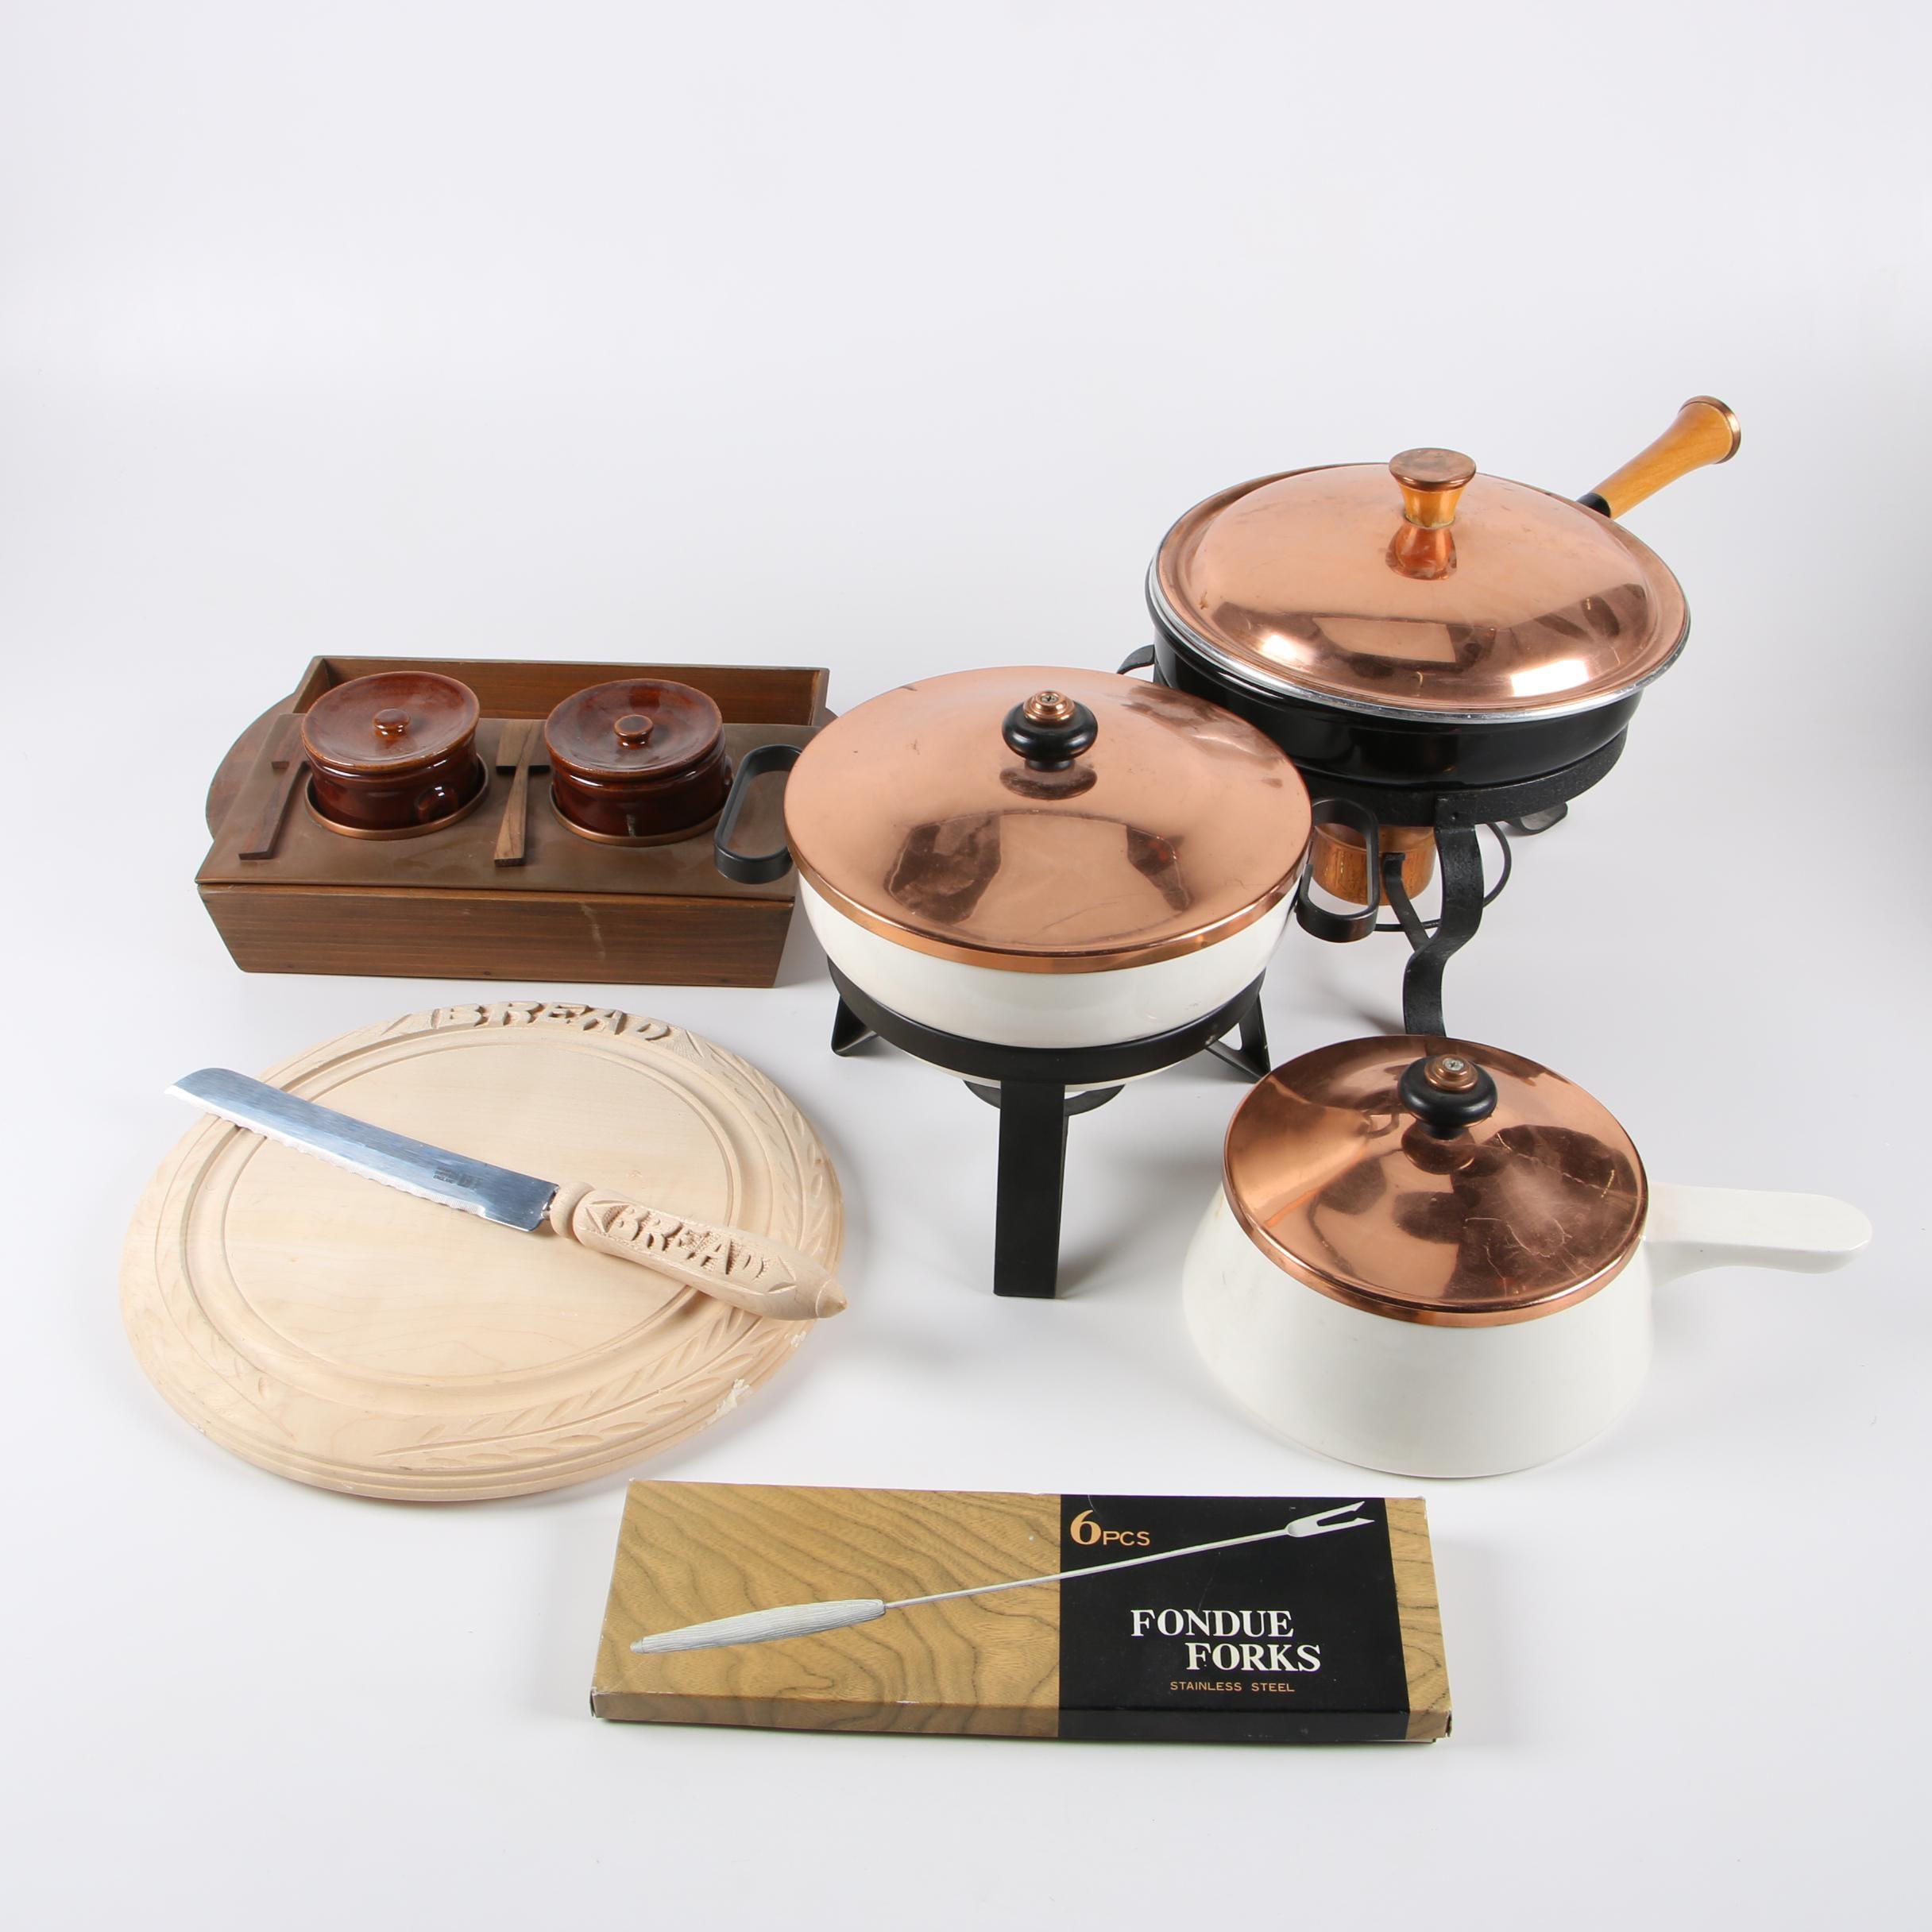 Cookware and Serveware including Fondue Sets